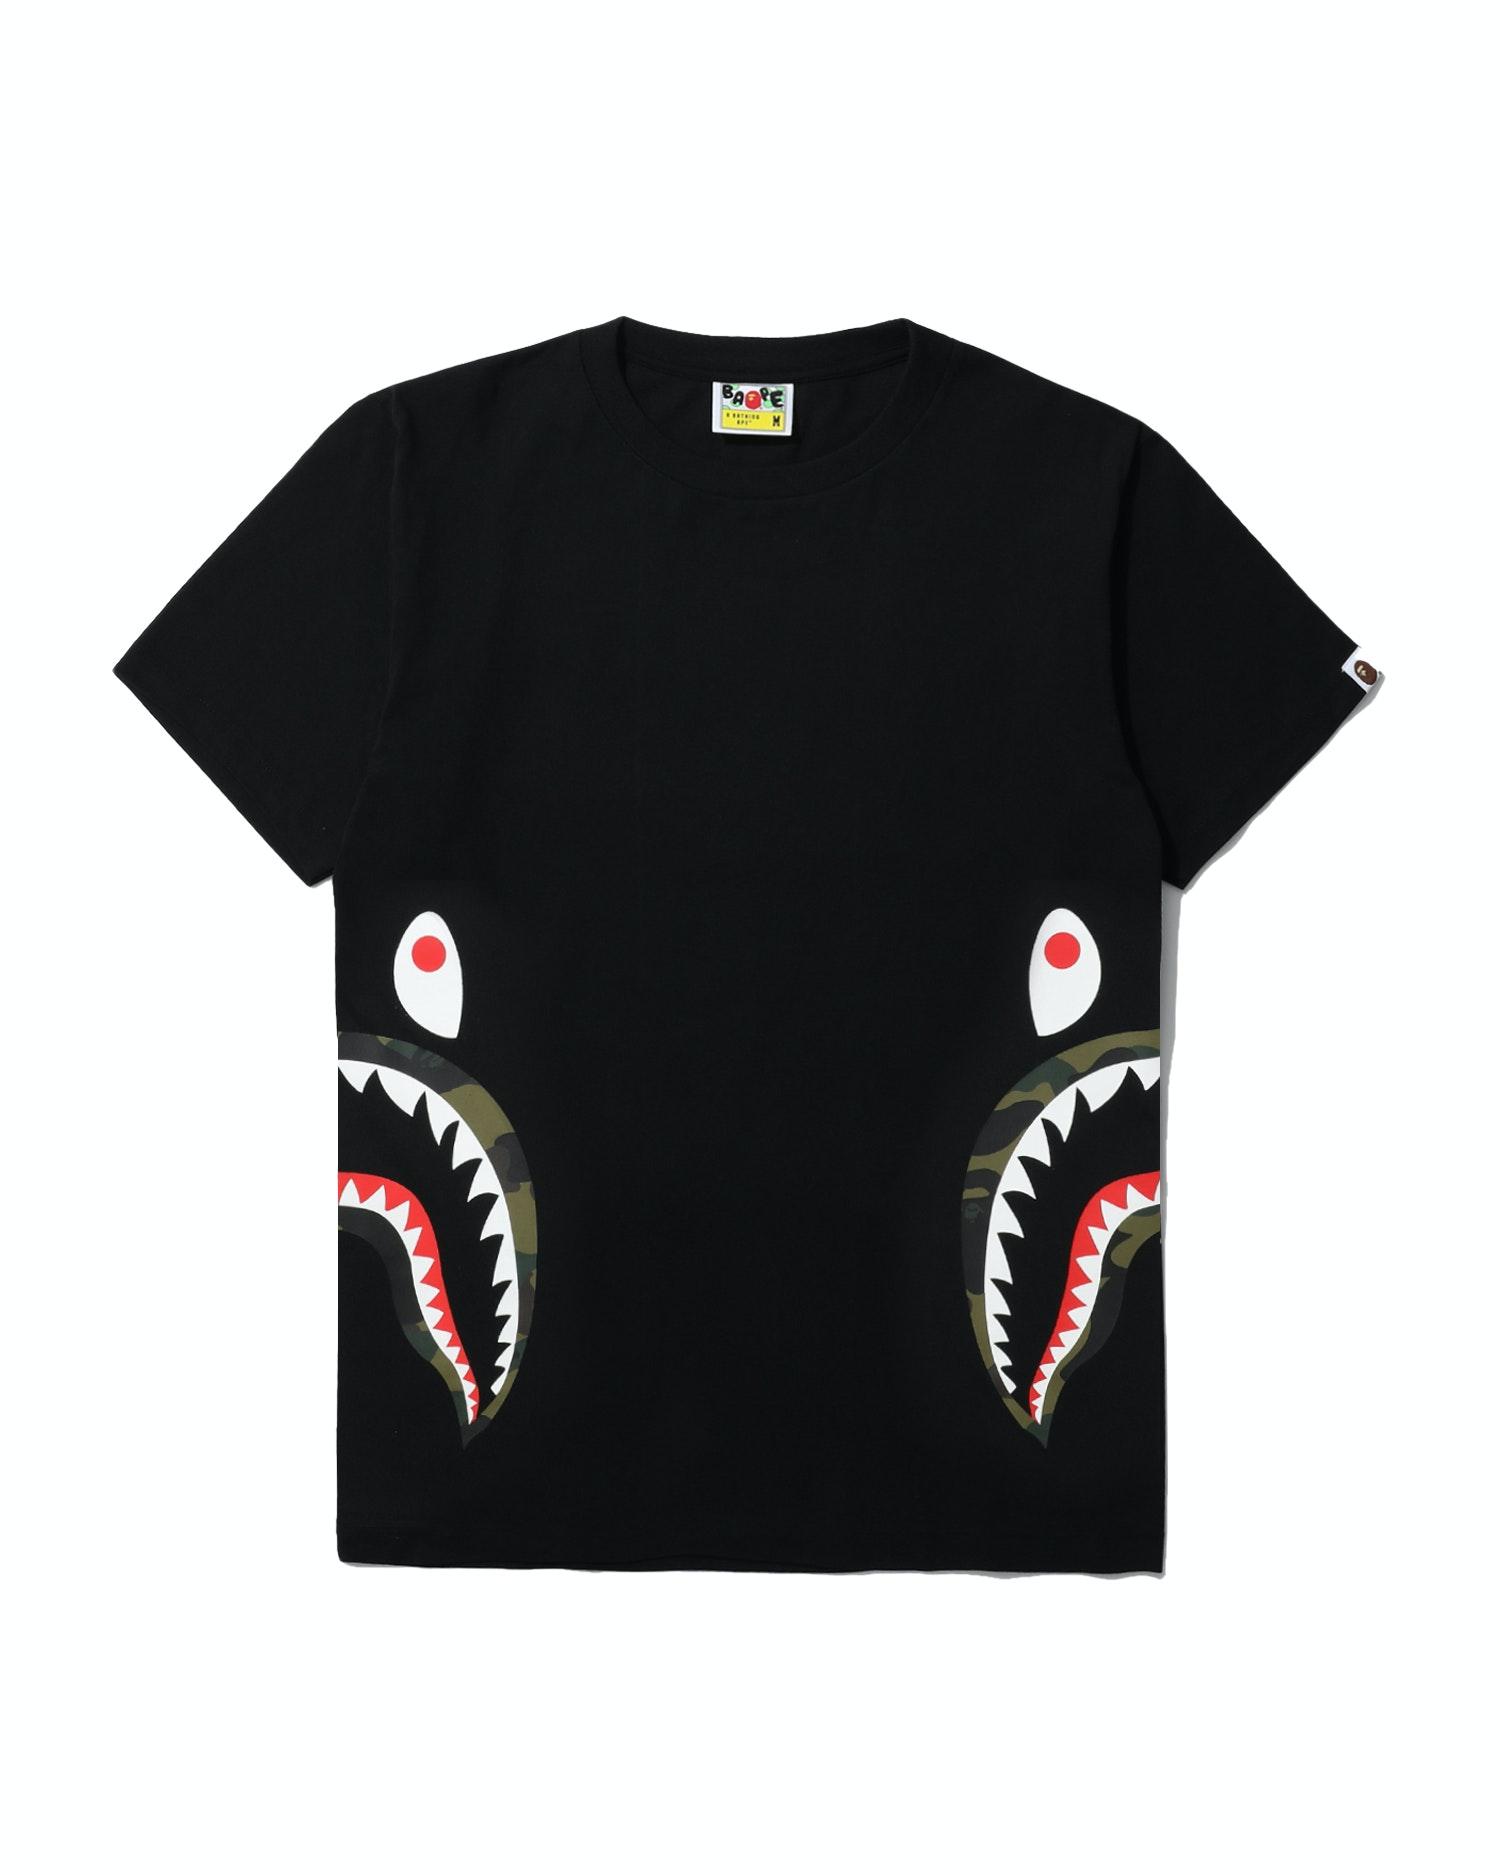 BAPE 1st Camo Side Shark Tee Black/Green